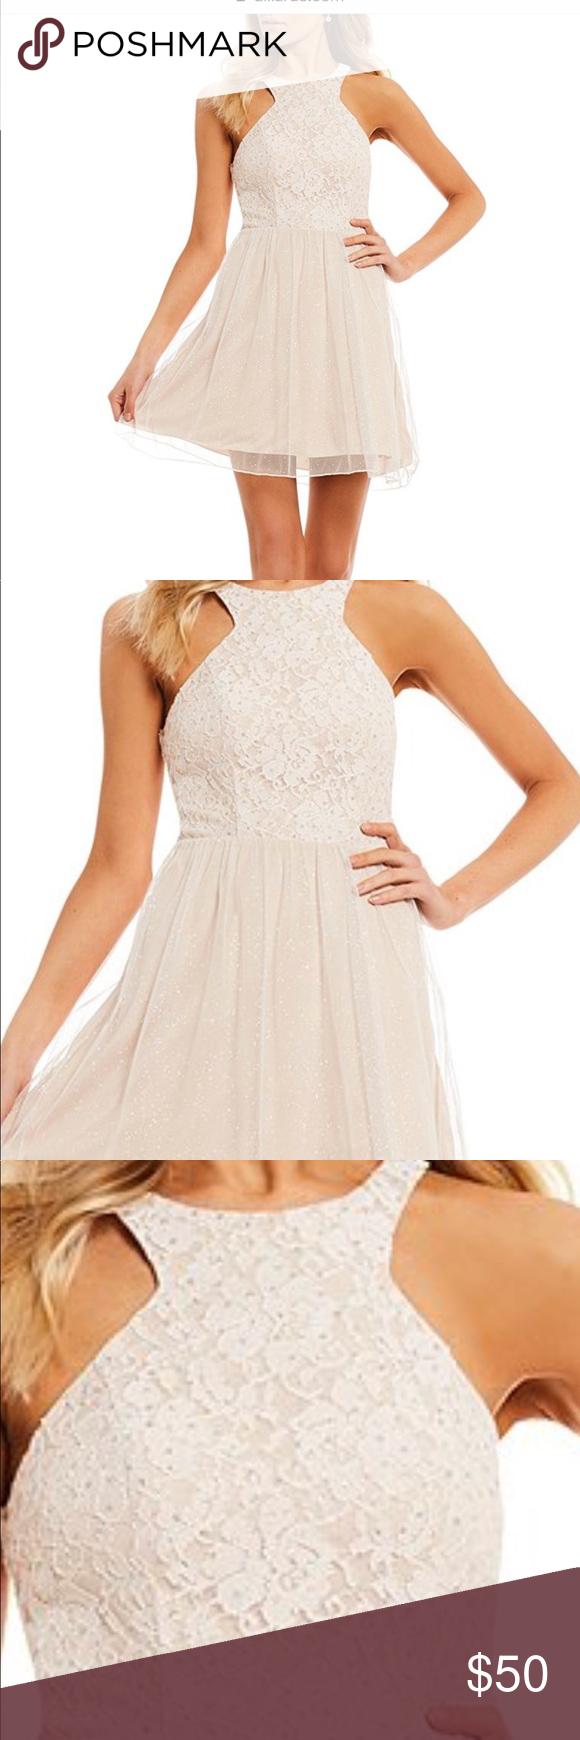 Xtraordinary prom dress size NWT Pinterest